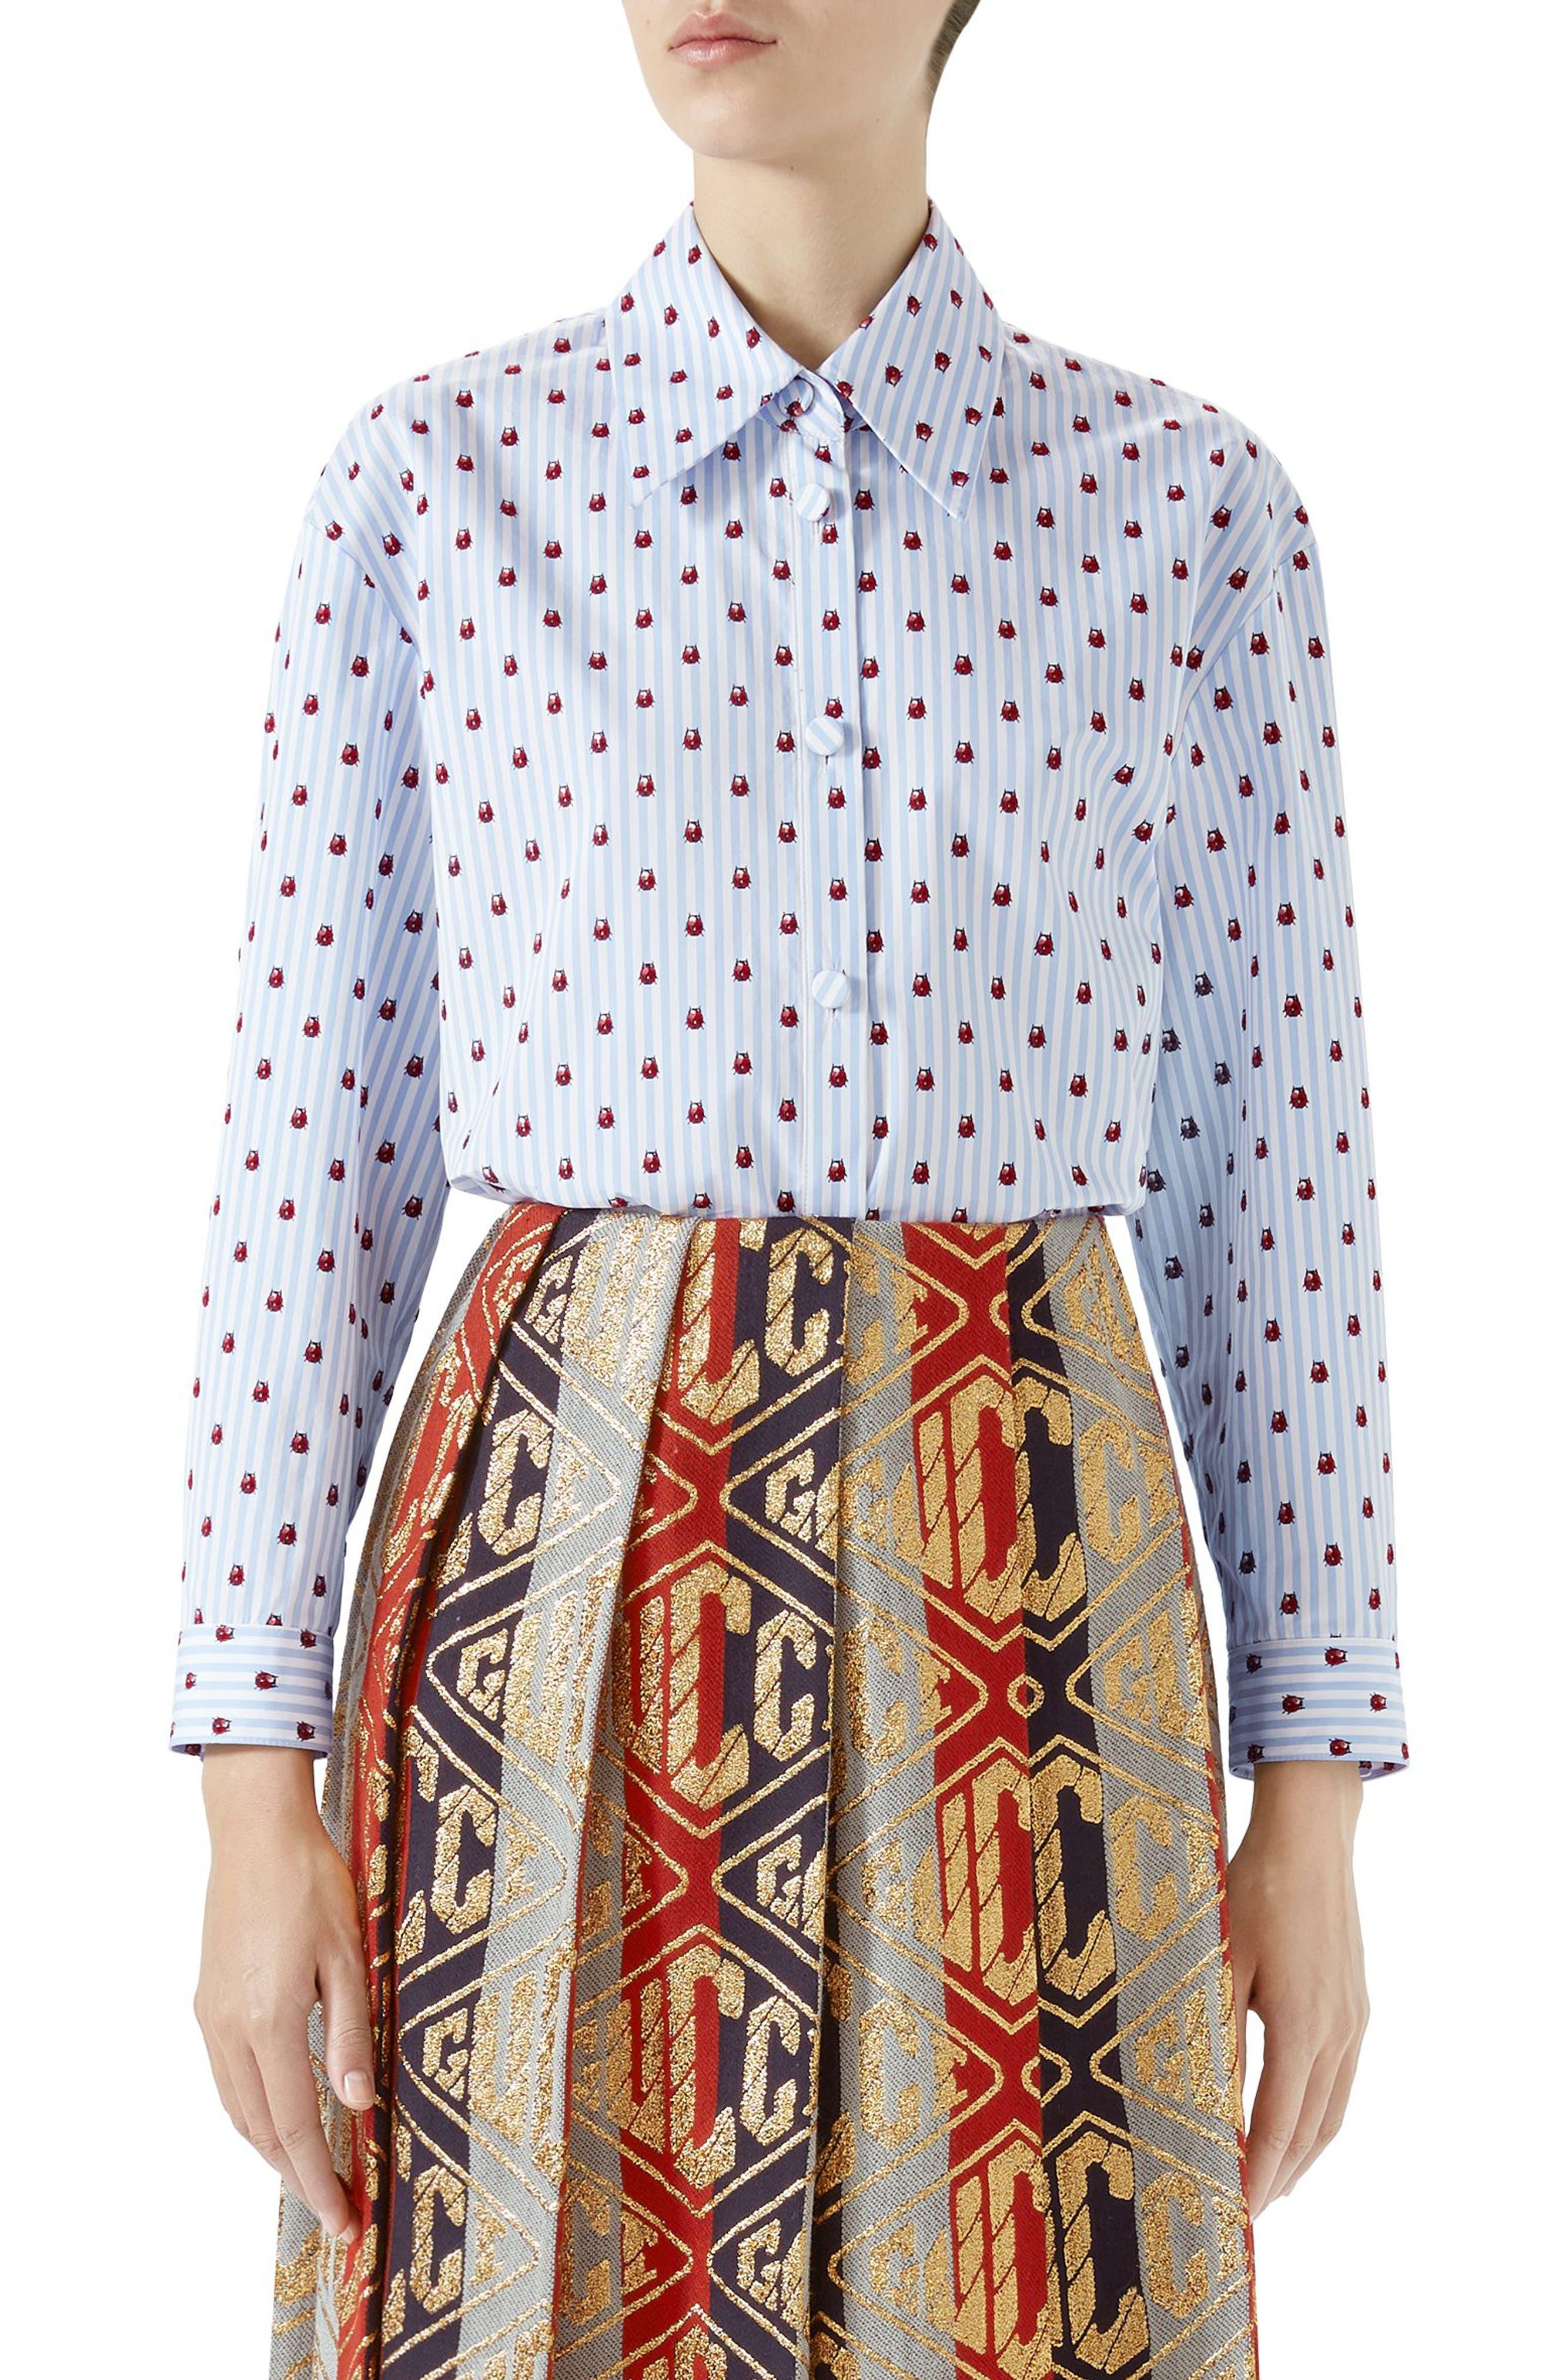 Ladybug Print Poplin Shirt,                         Main,                         color, BLUE PRINT